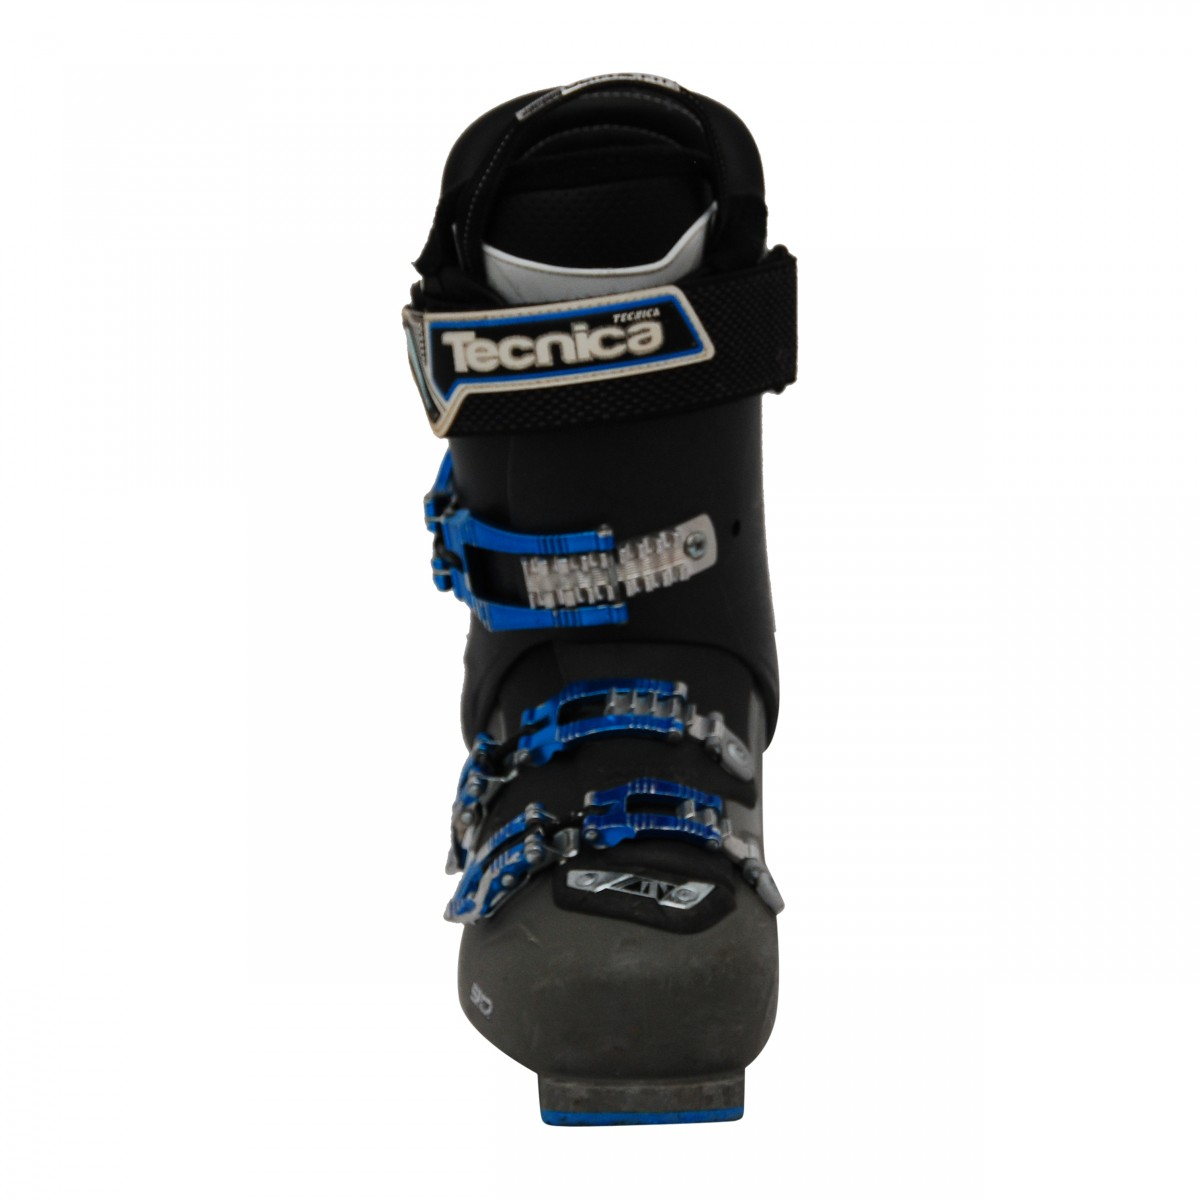 Chaussure-de-ski-occasion-Tecnica-Magnum-90-RT miniature 5